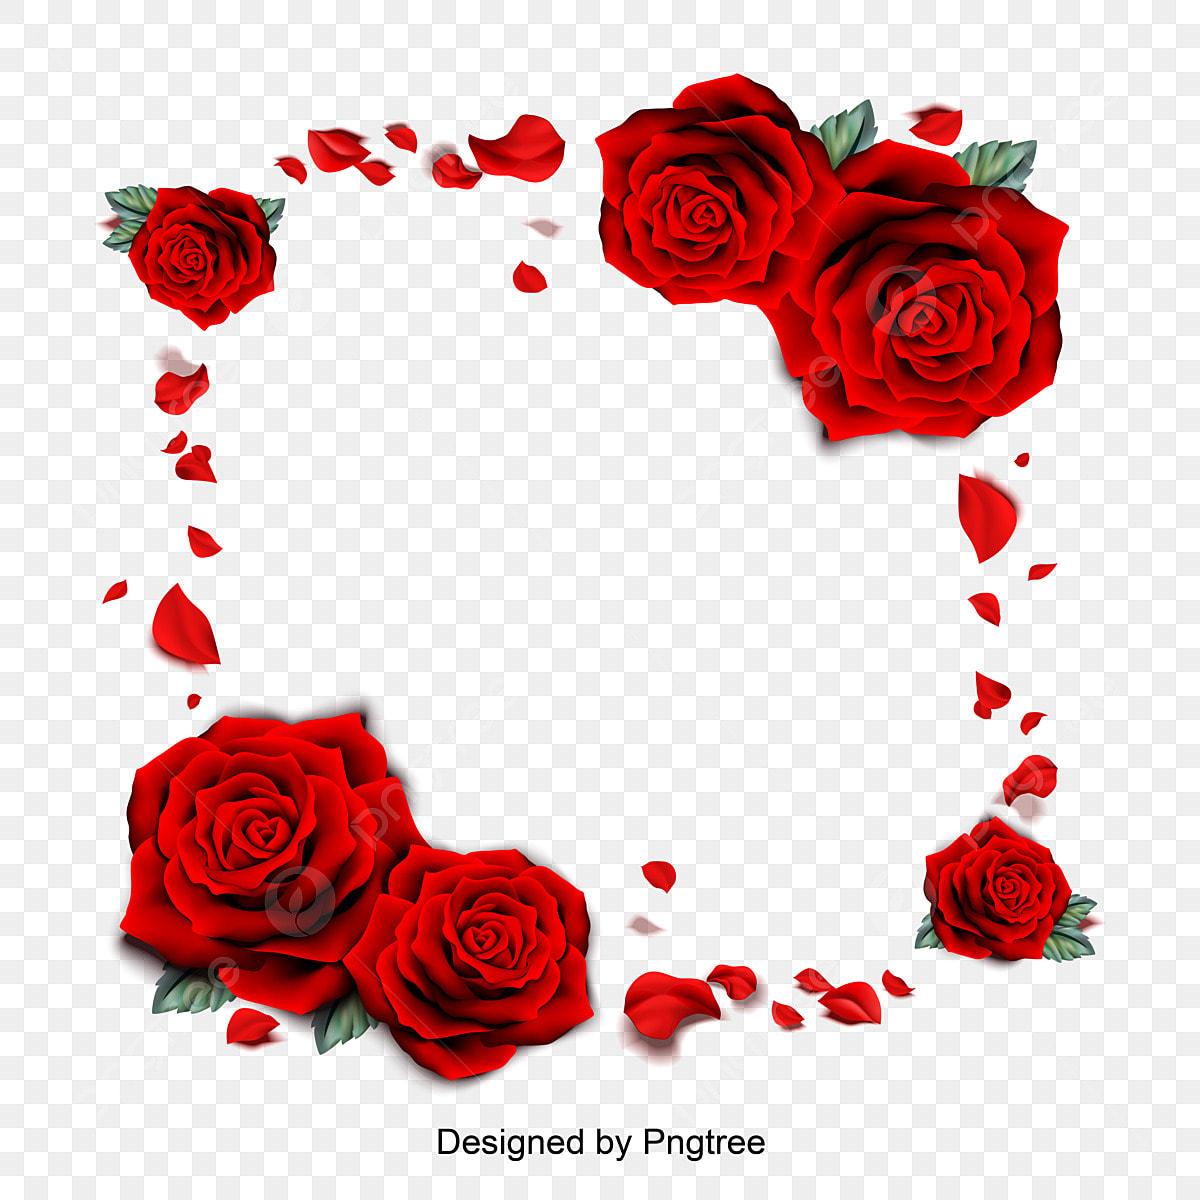 Vector Illustration Of Red Rose Petal Borders Romantic Valentines